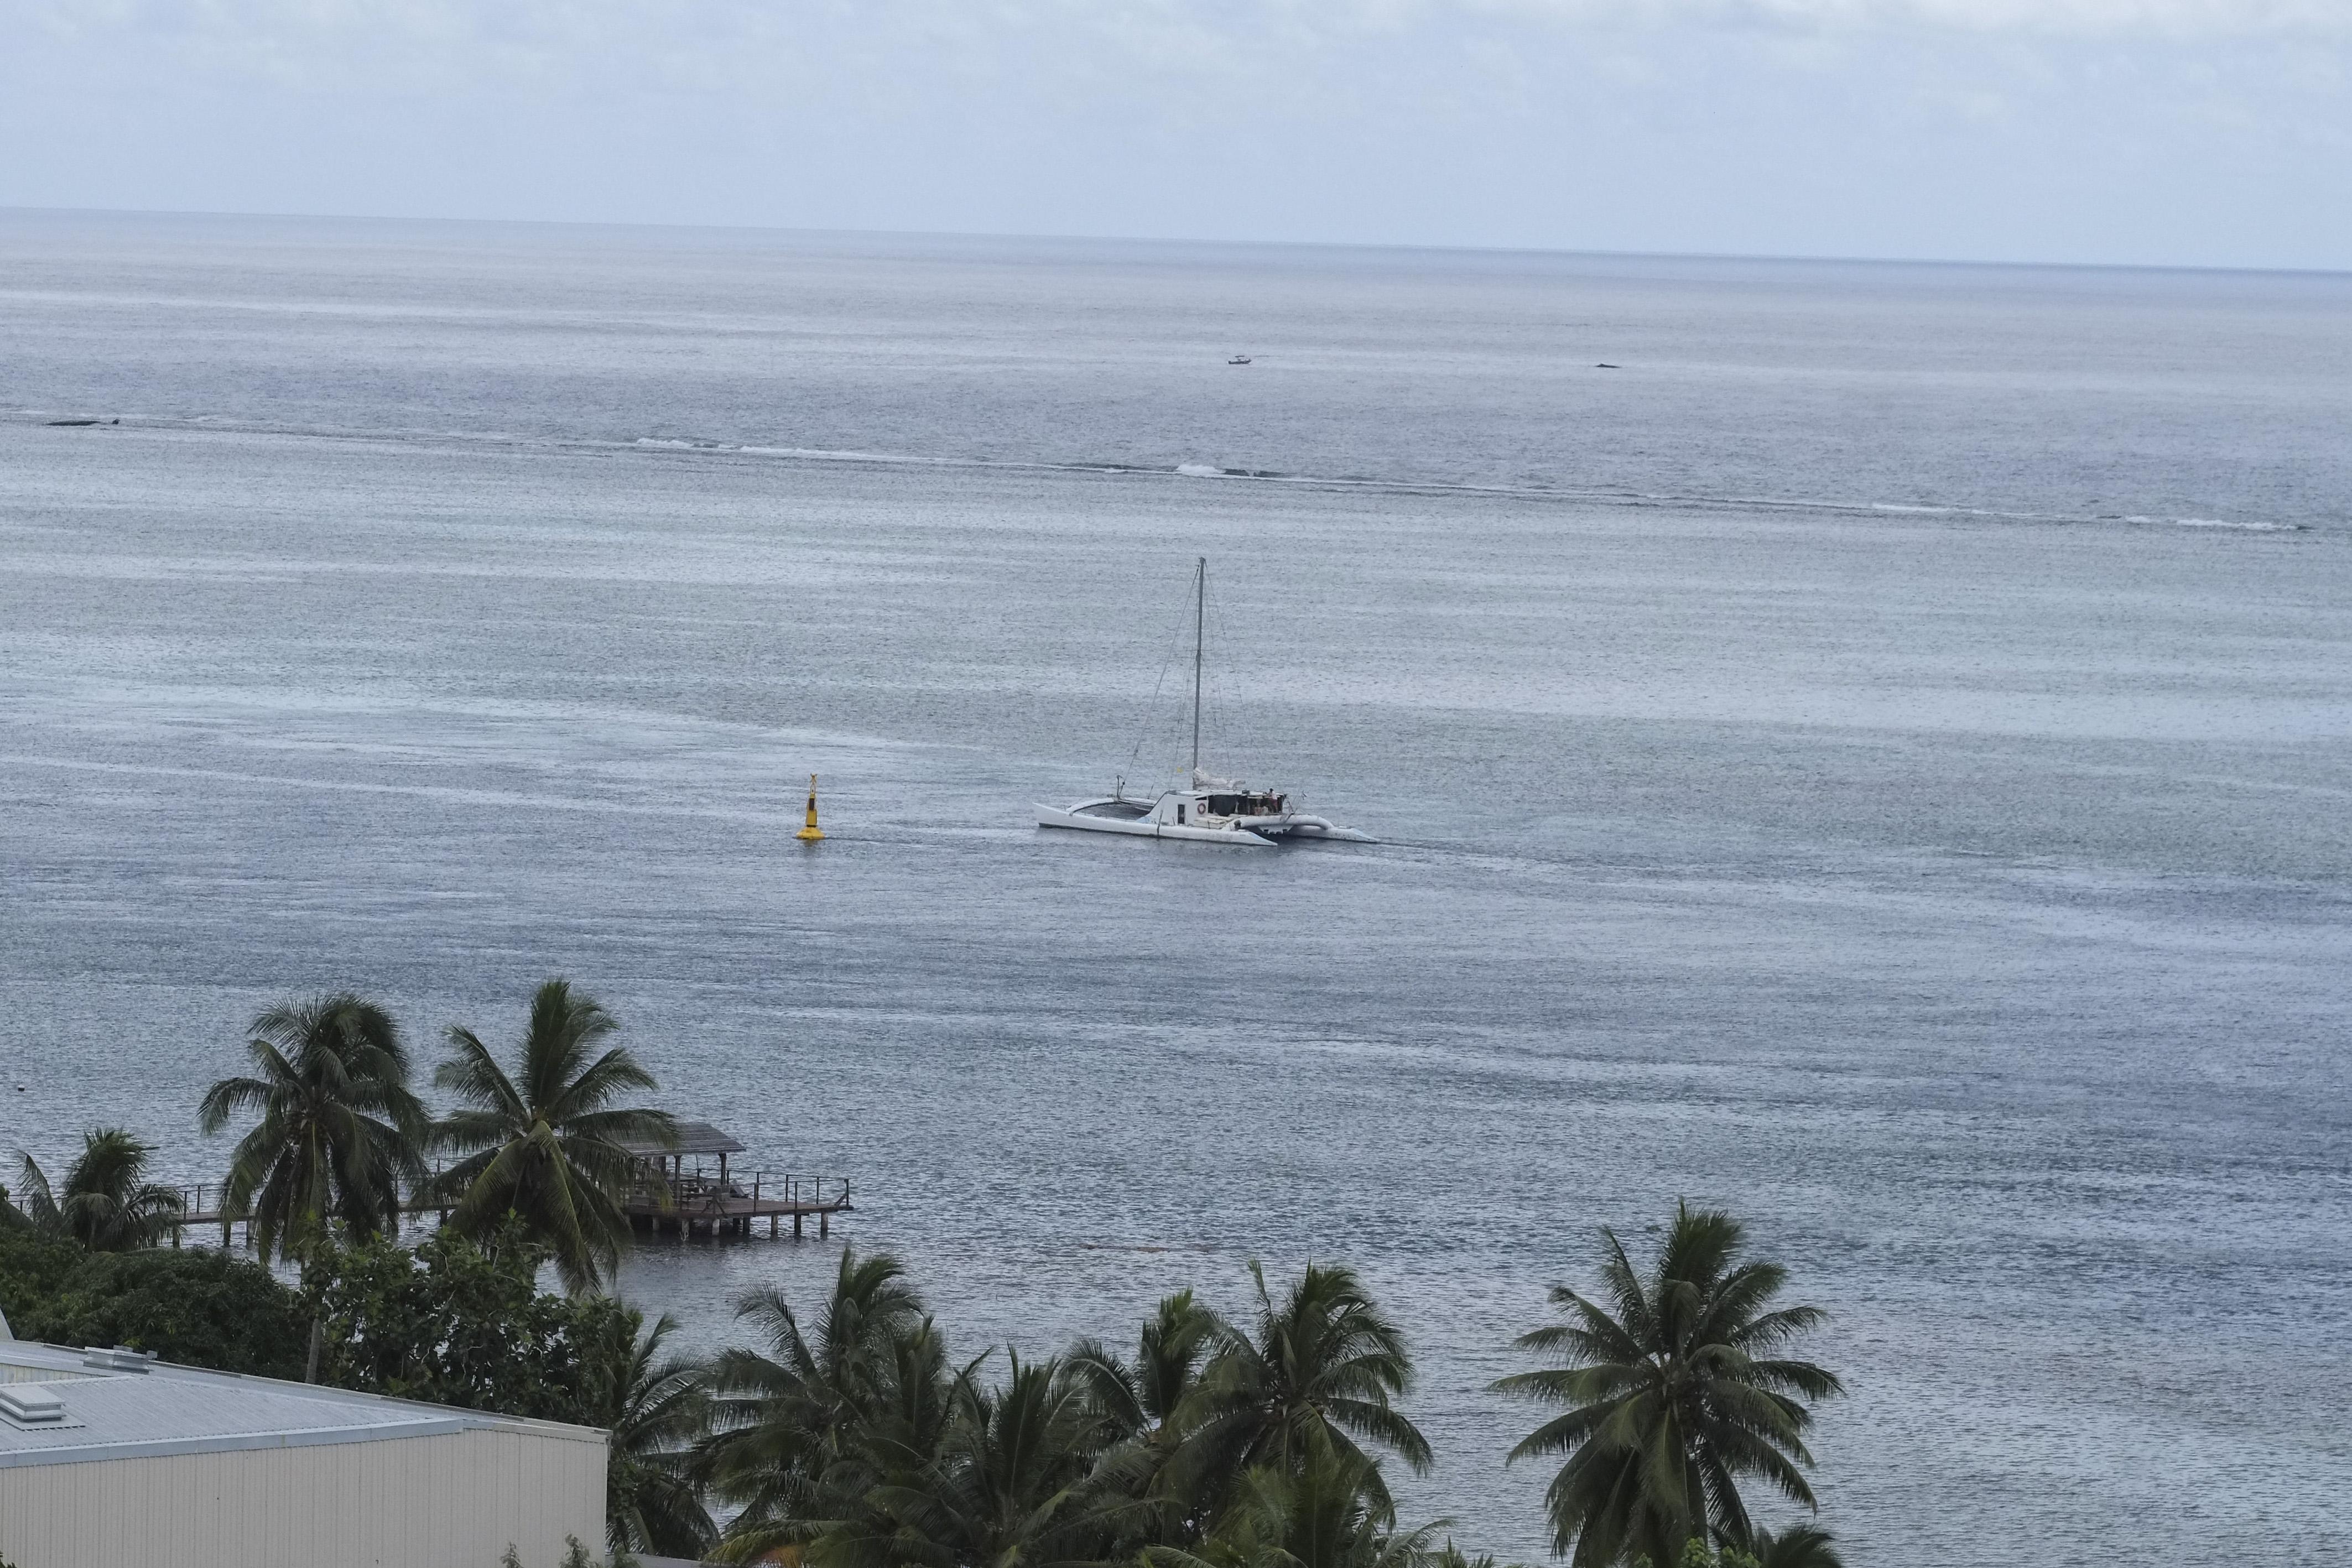 Le maxi-catamaran Jet France est arrivé à Tahiti